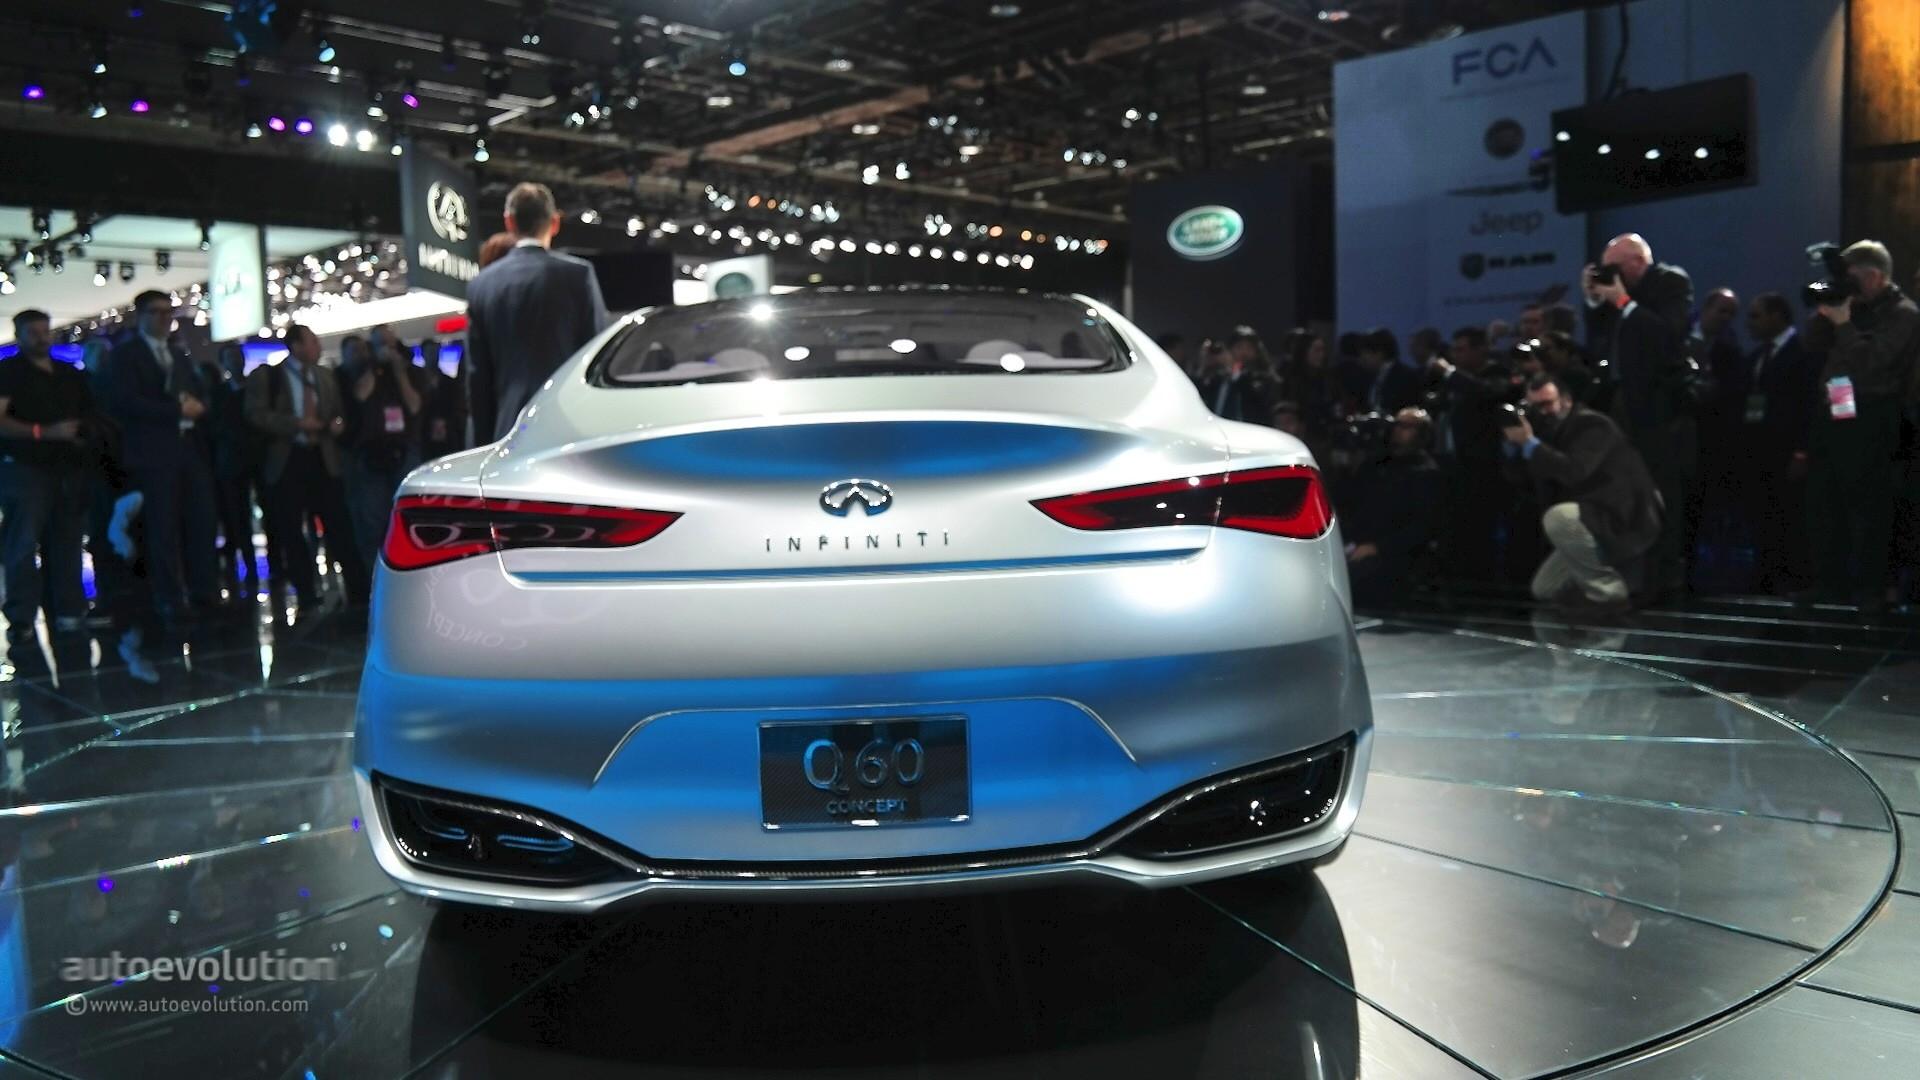 2016 Infiniti Q60 Coupe Concept